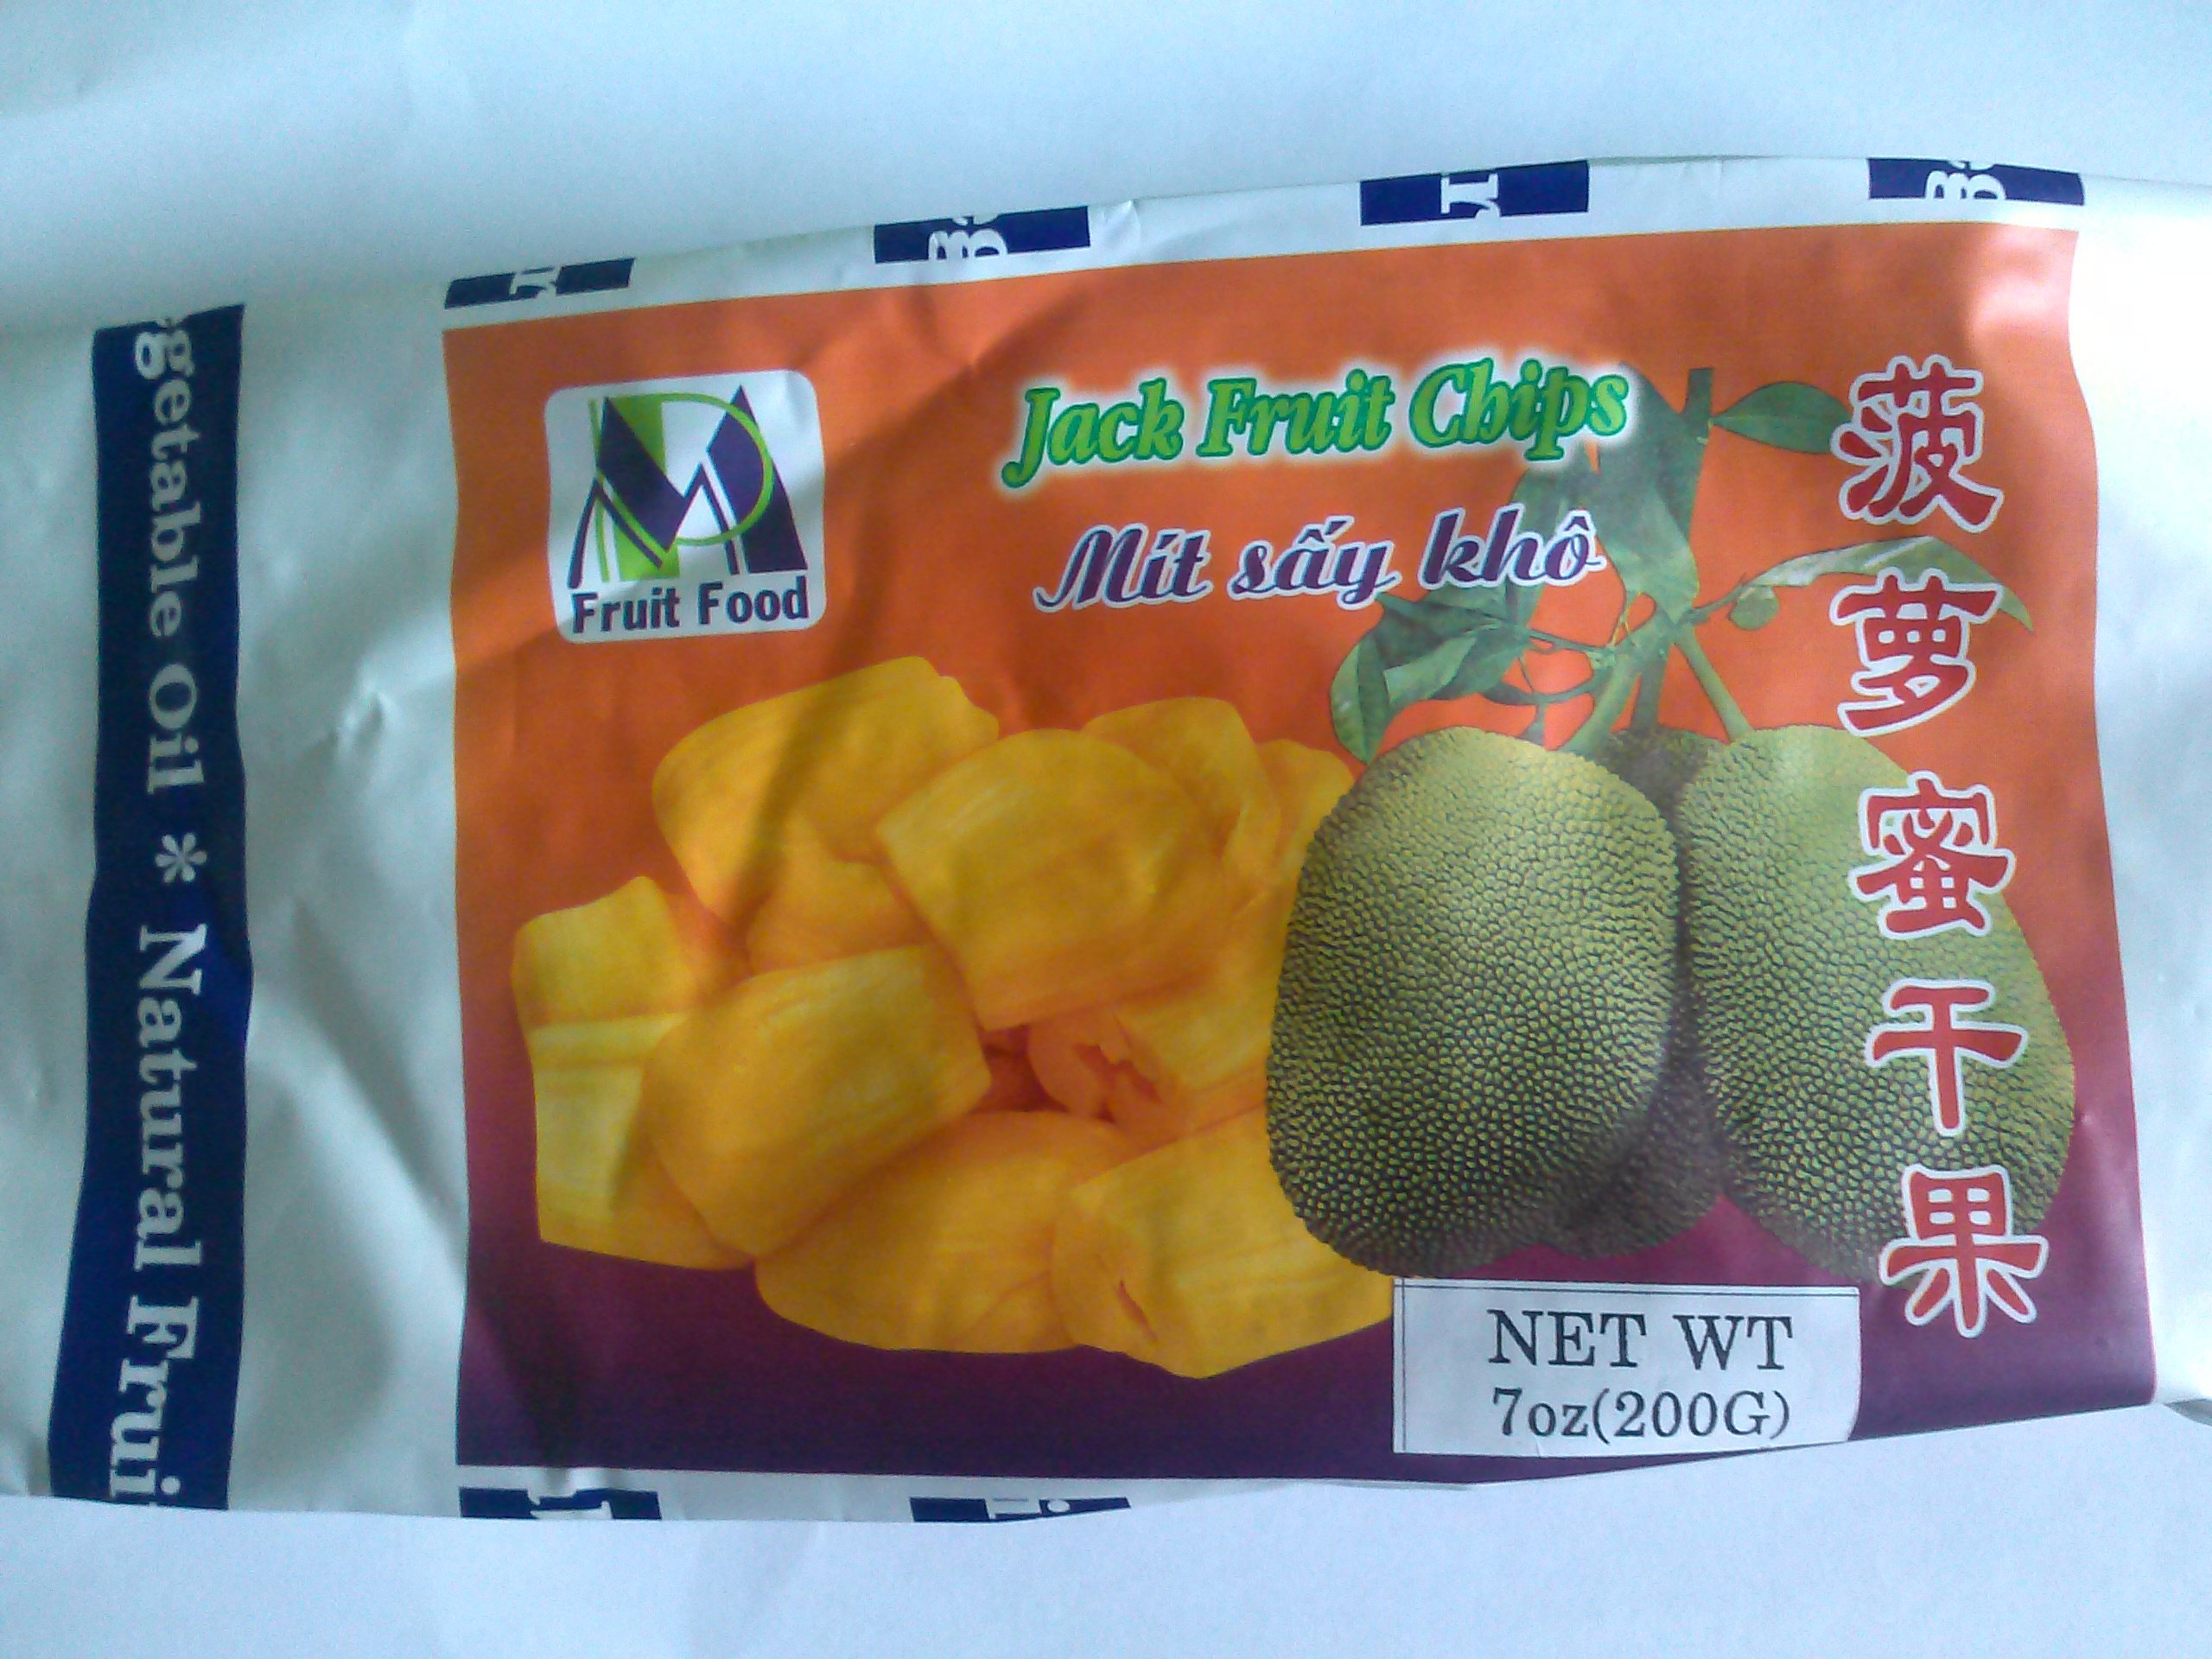 Jackfruit Chips - 2 x 7 oz / 2 x 200 g - Product of Thailand - Natural Jack Fruit chips